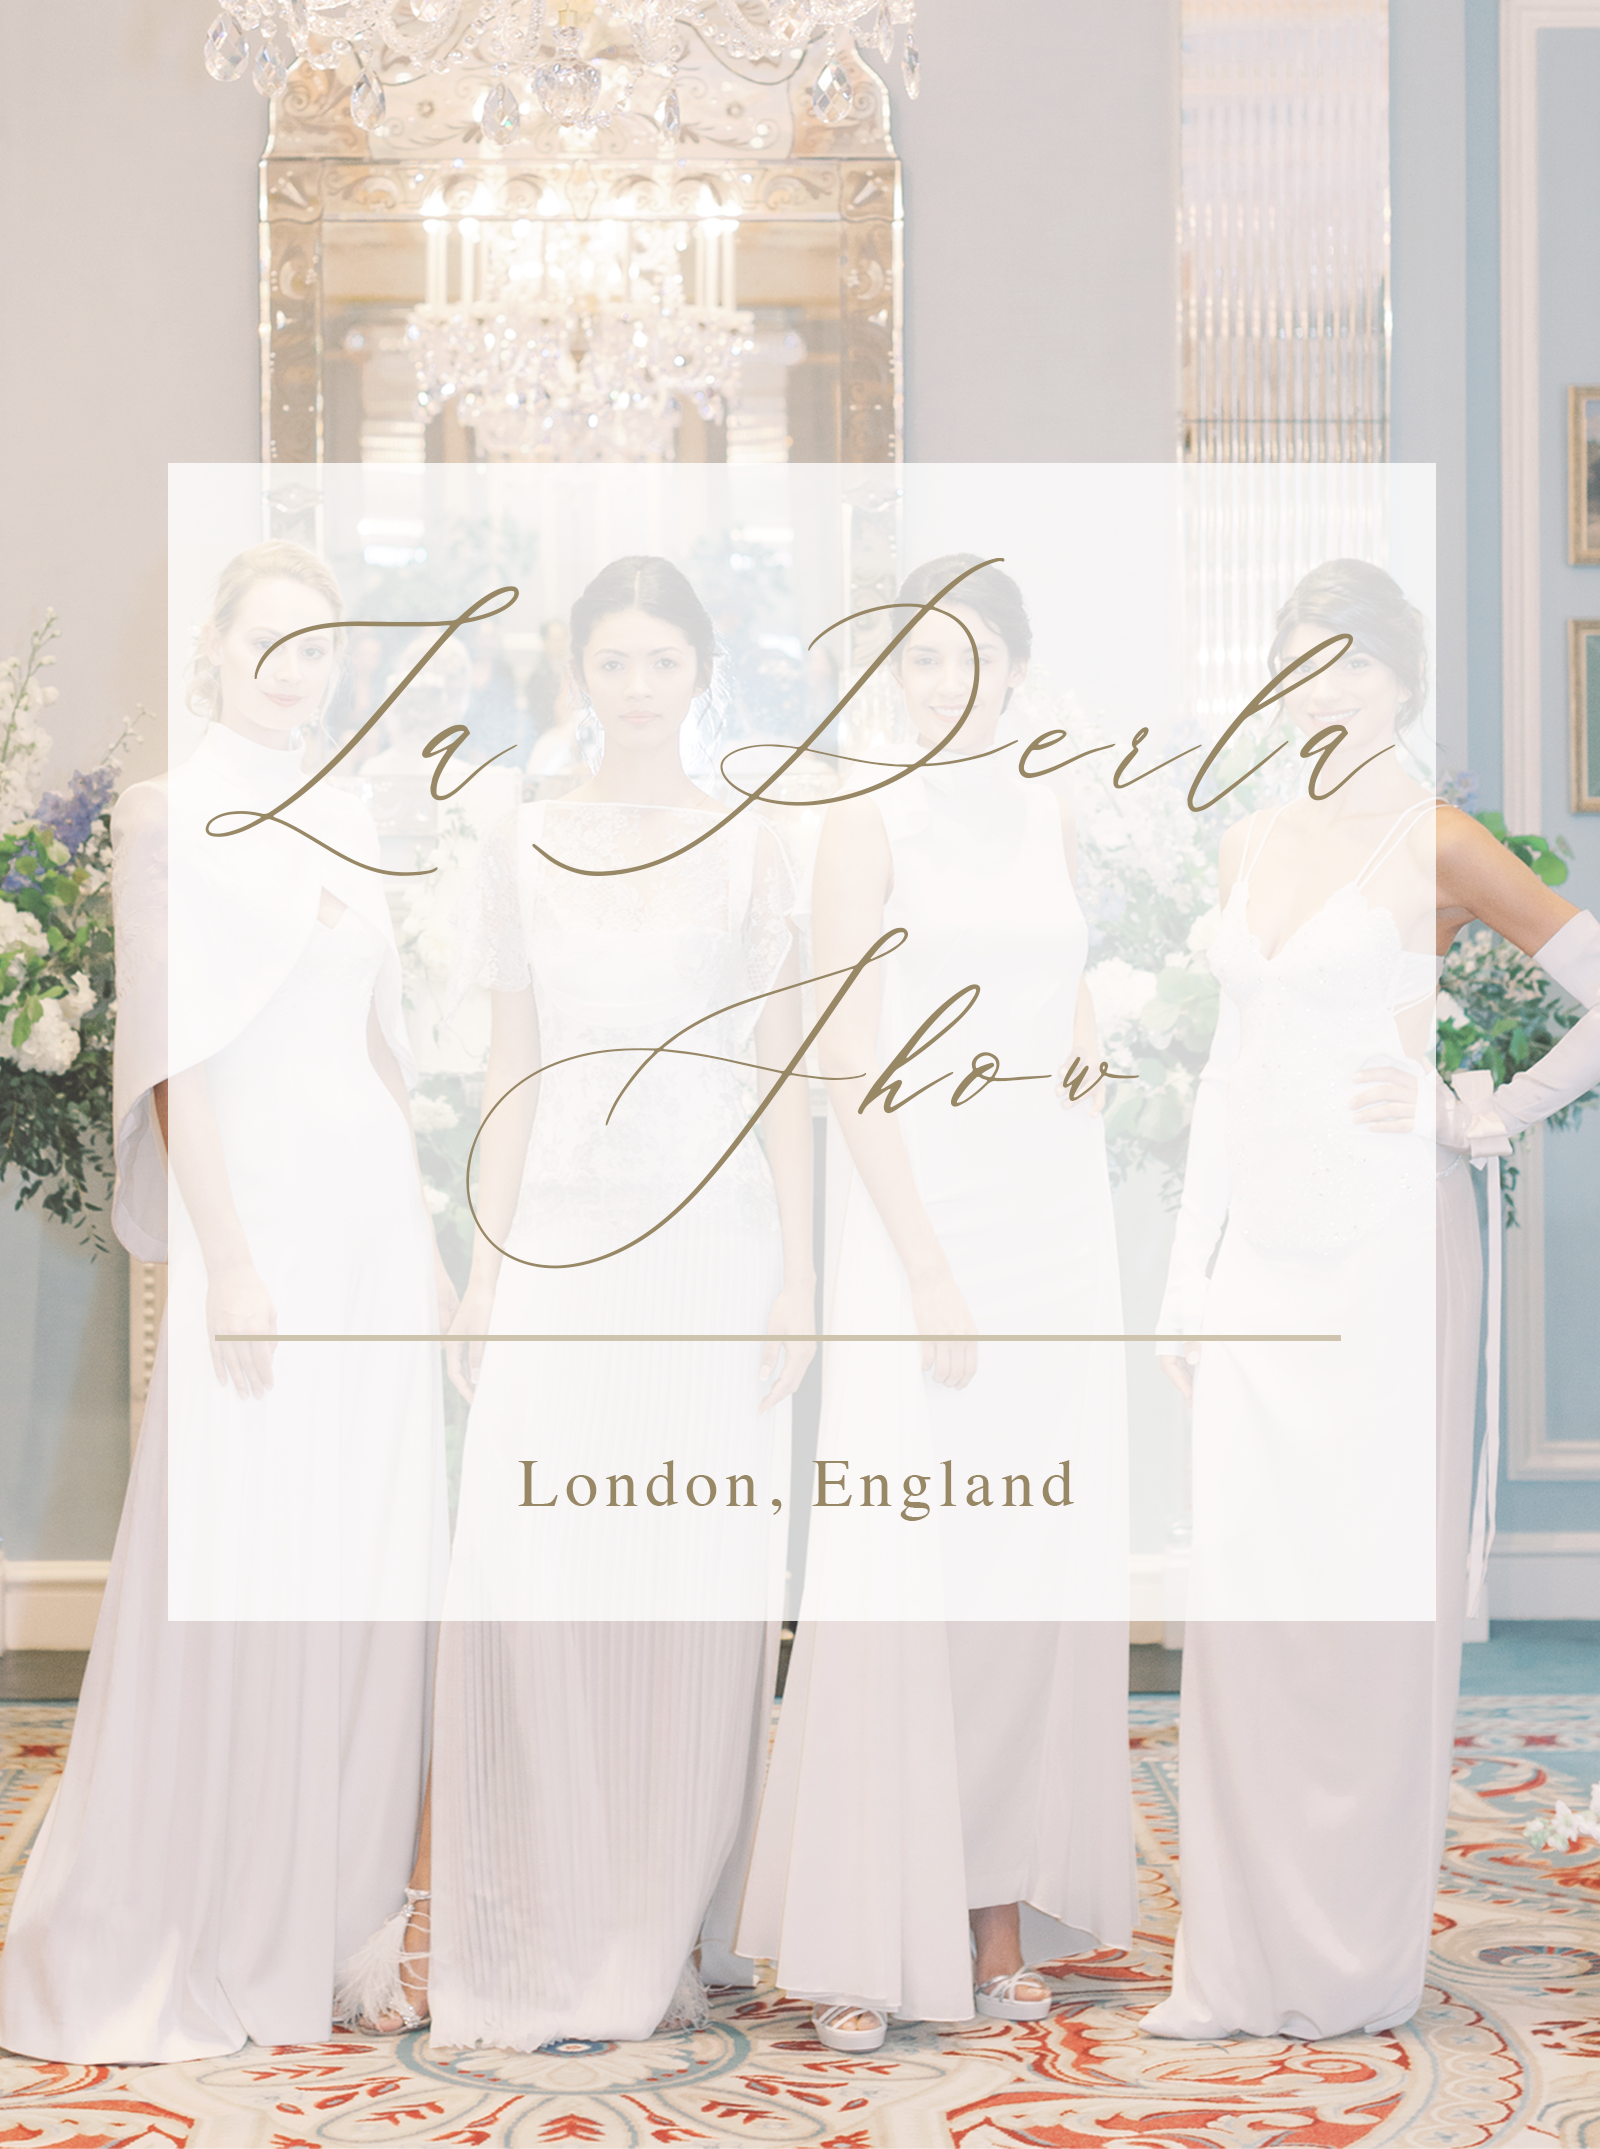 La Perla _ Lily+&+Sage+_+Luxury+Wedding+Planner+_+Bridal+Fashion+Show+Fashion+Stylist+Event+Stylist+Lanesborough+Hotel+London+Bridal+Collection+Fashion+Events+Events+Styling+_+La+Perla Show.png